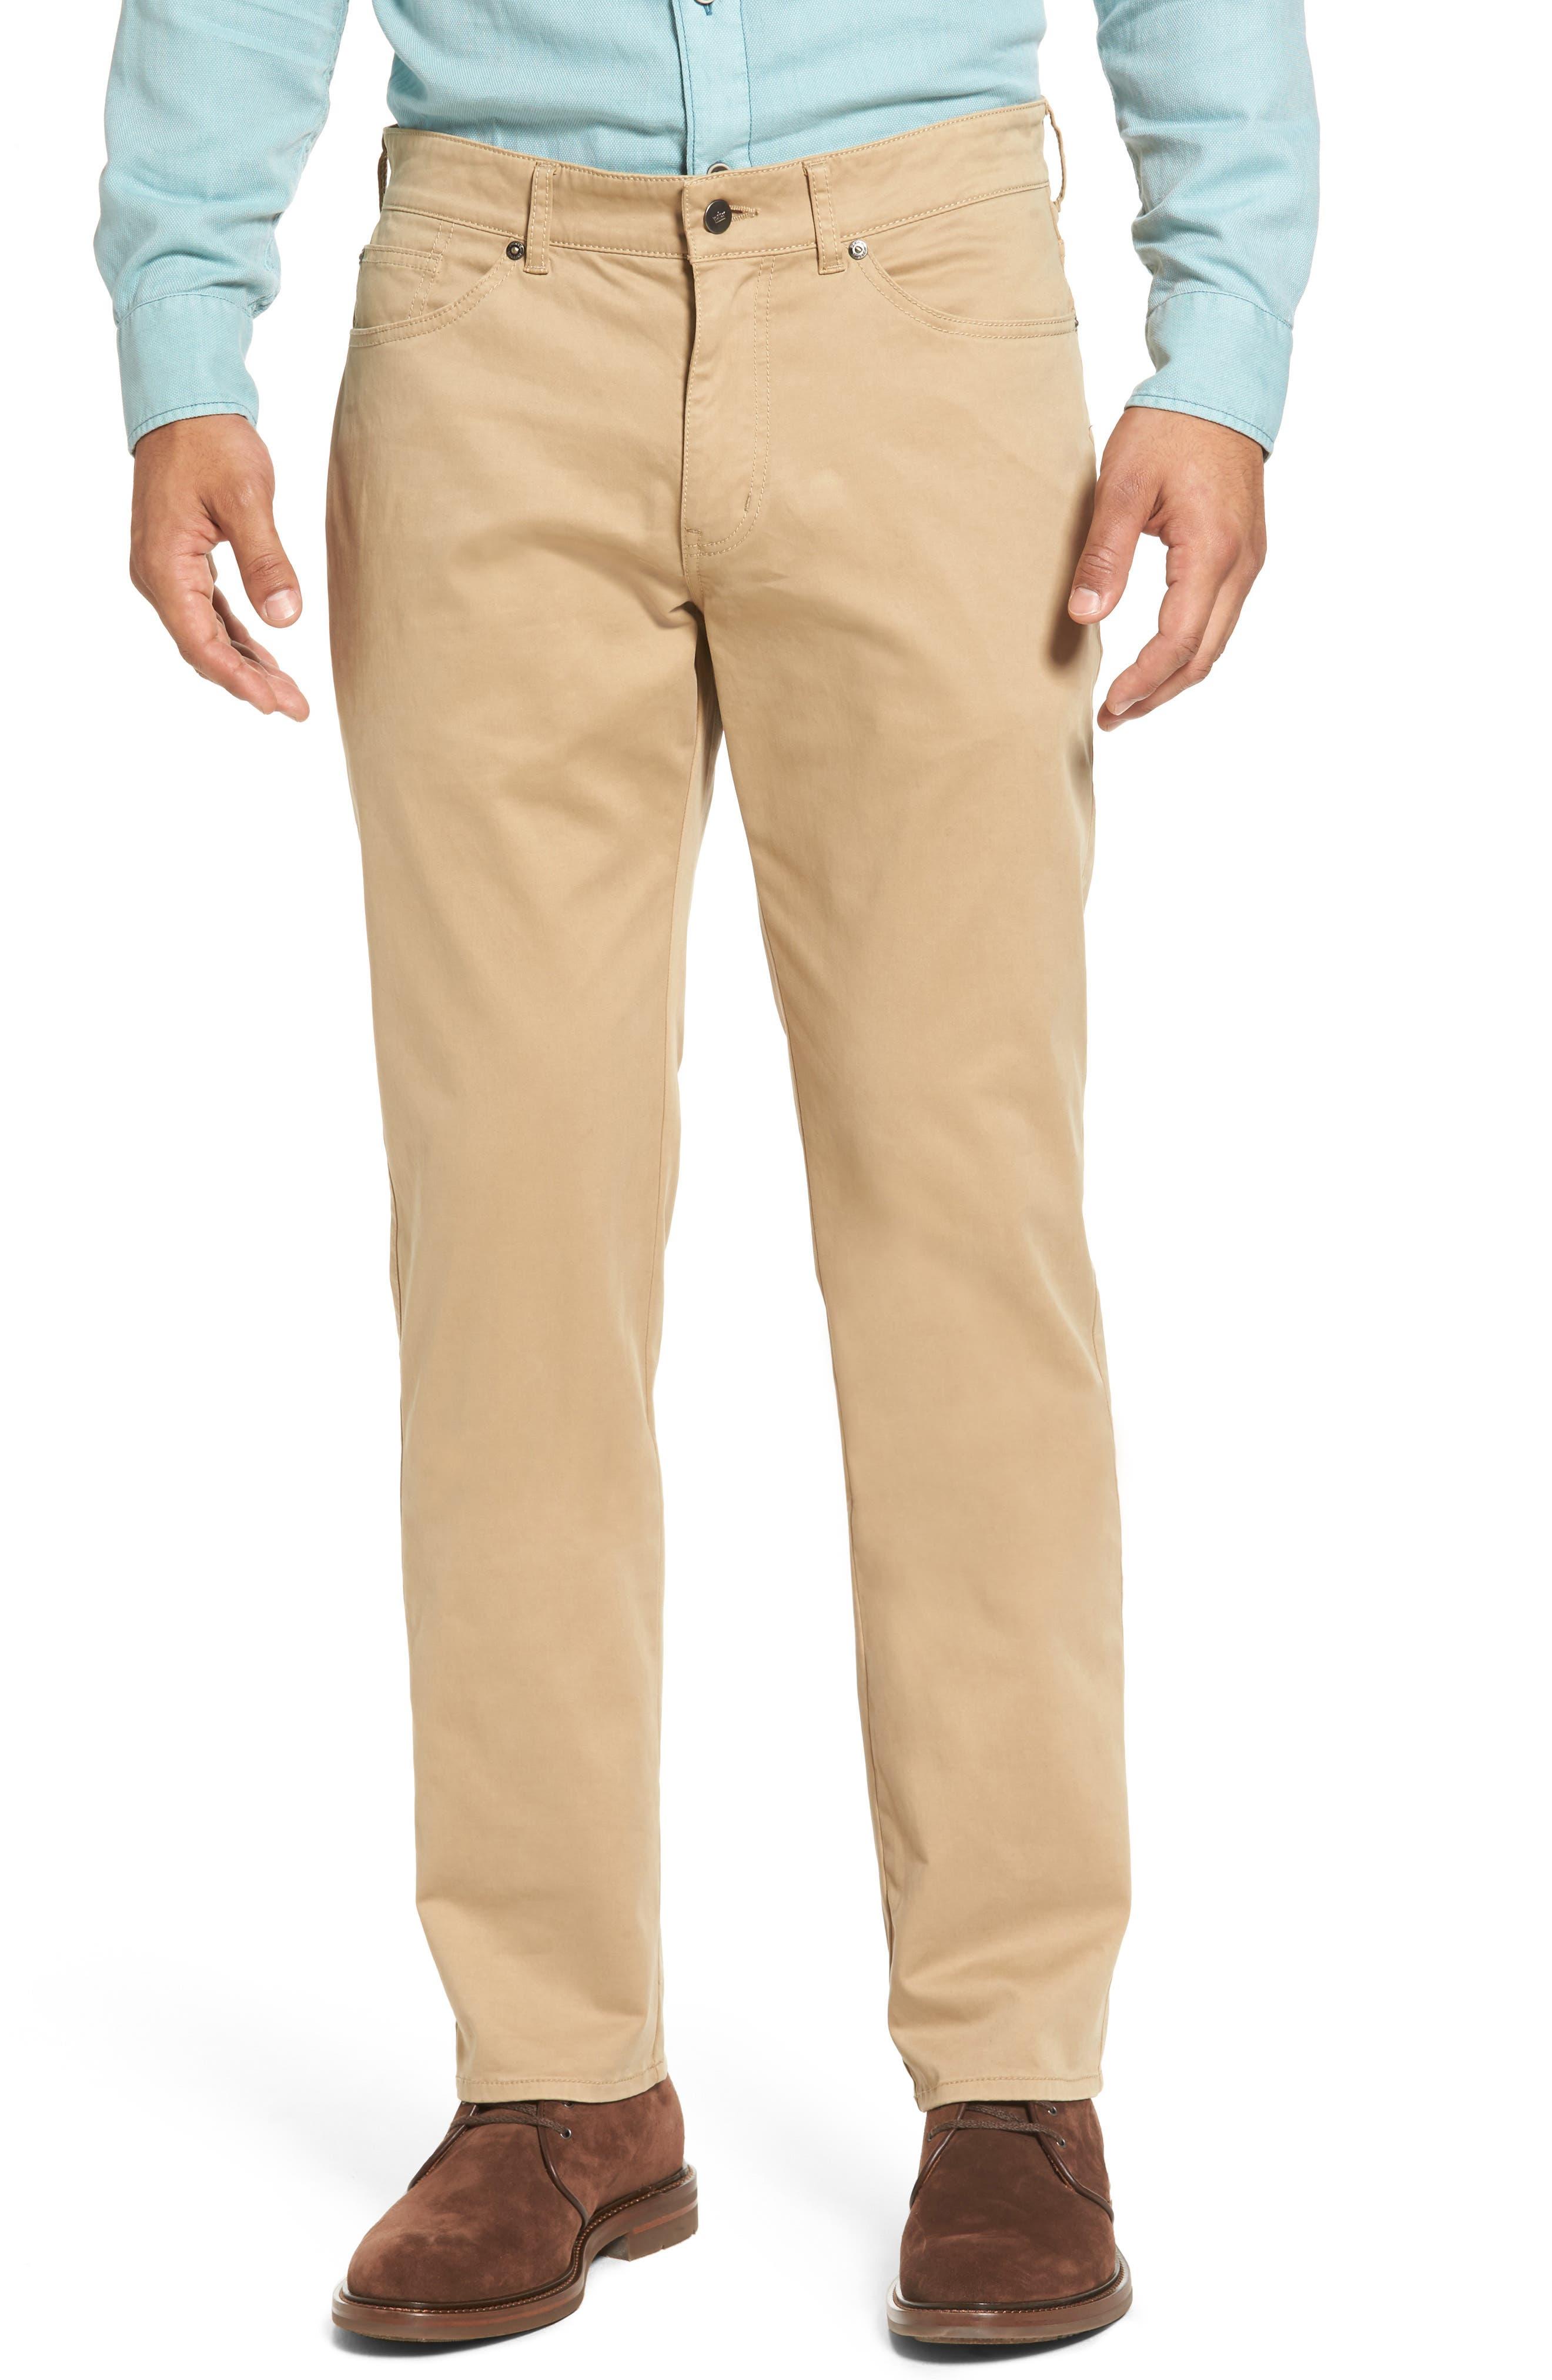 Peter Millar Stretch Sateen Five-Pocket Pants (Regular & Big)